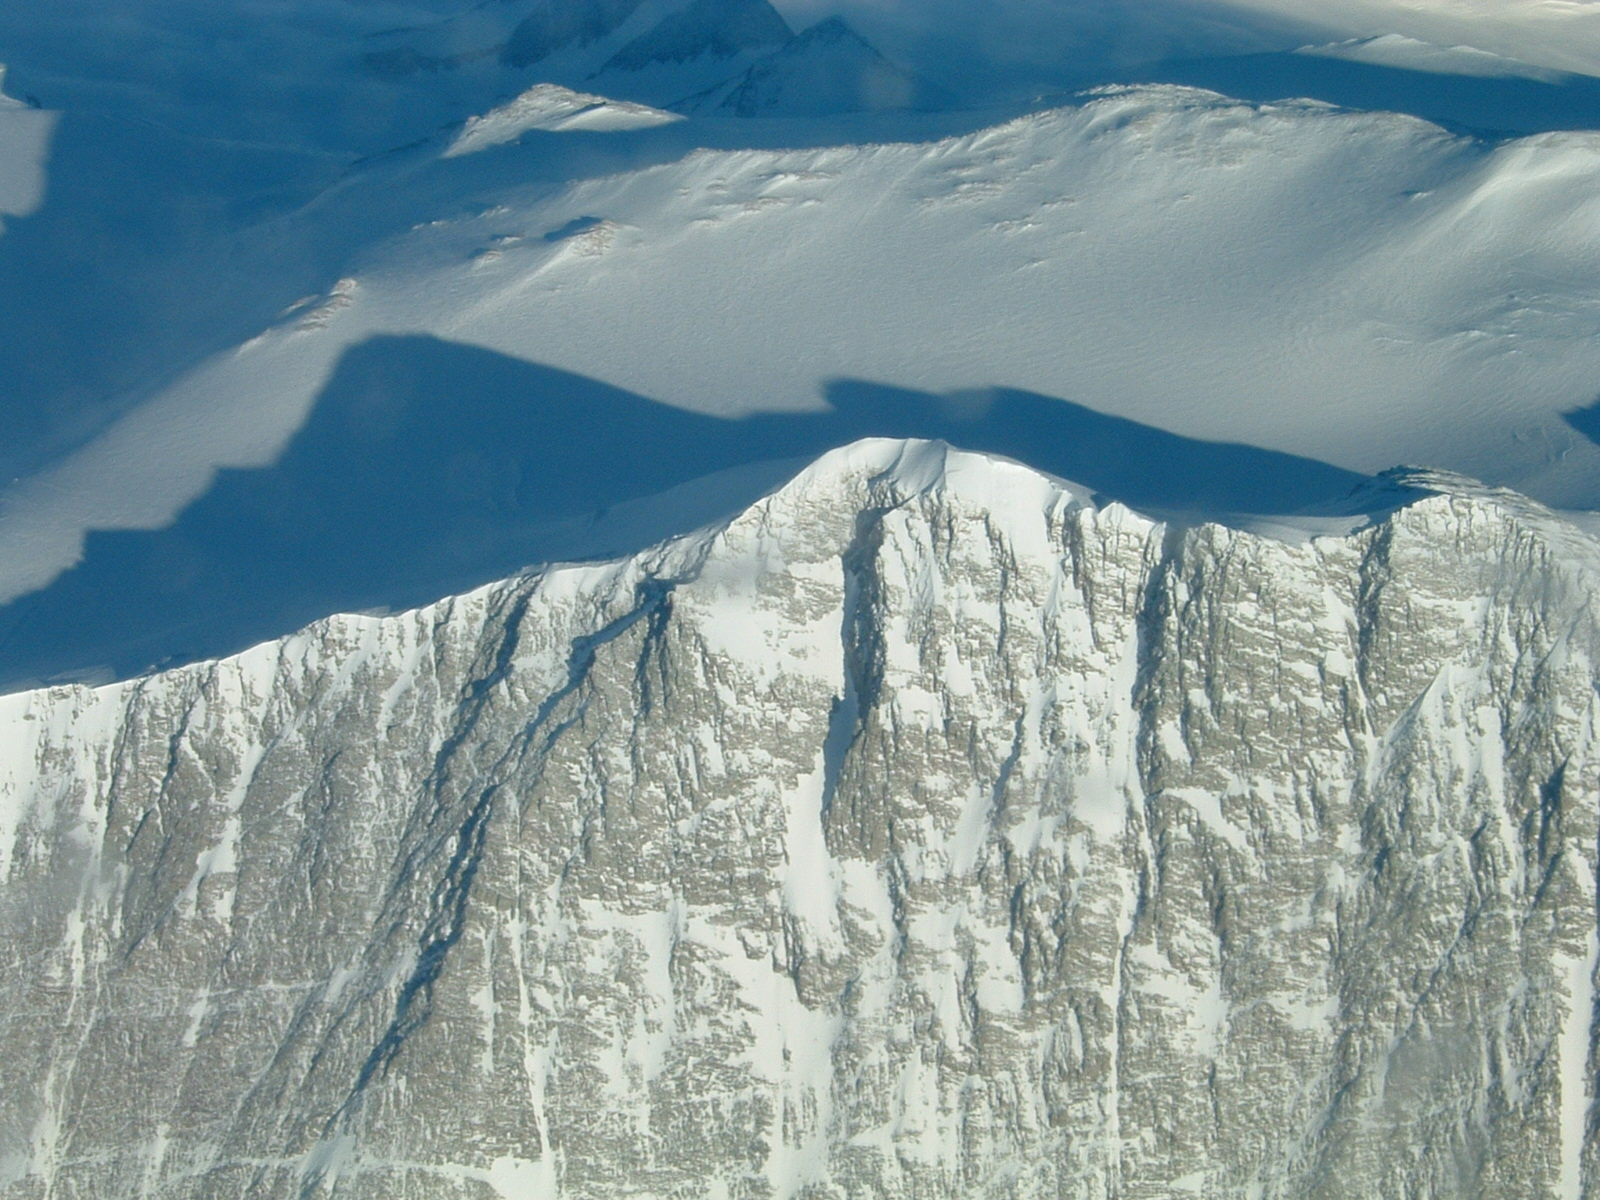 Mount_vinson_massif